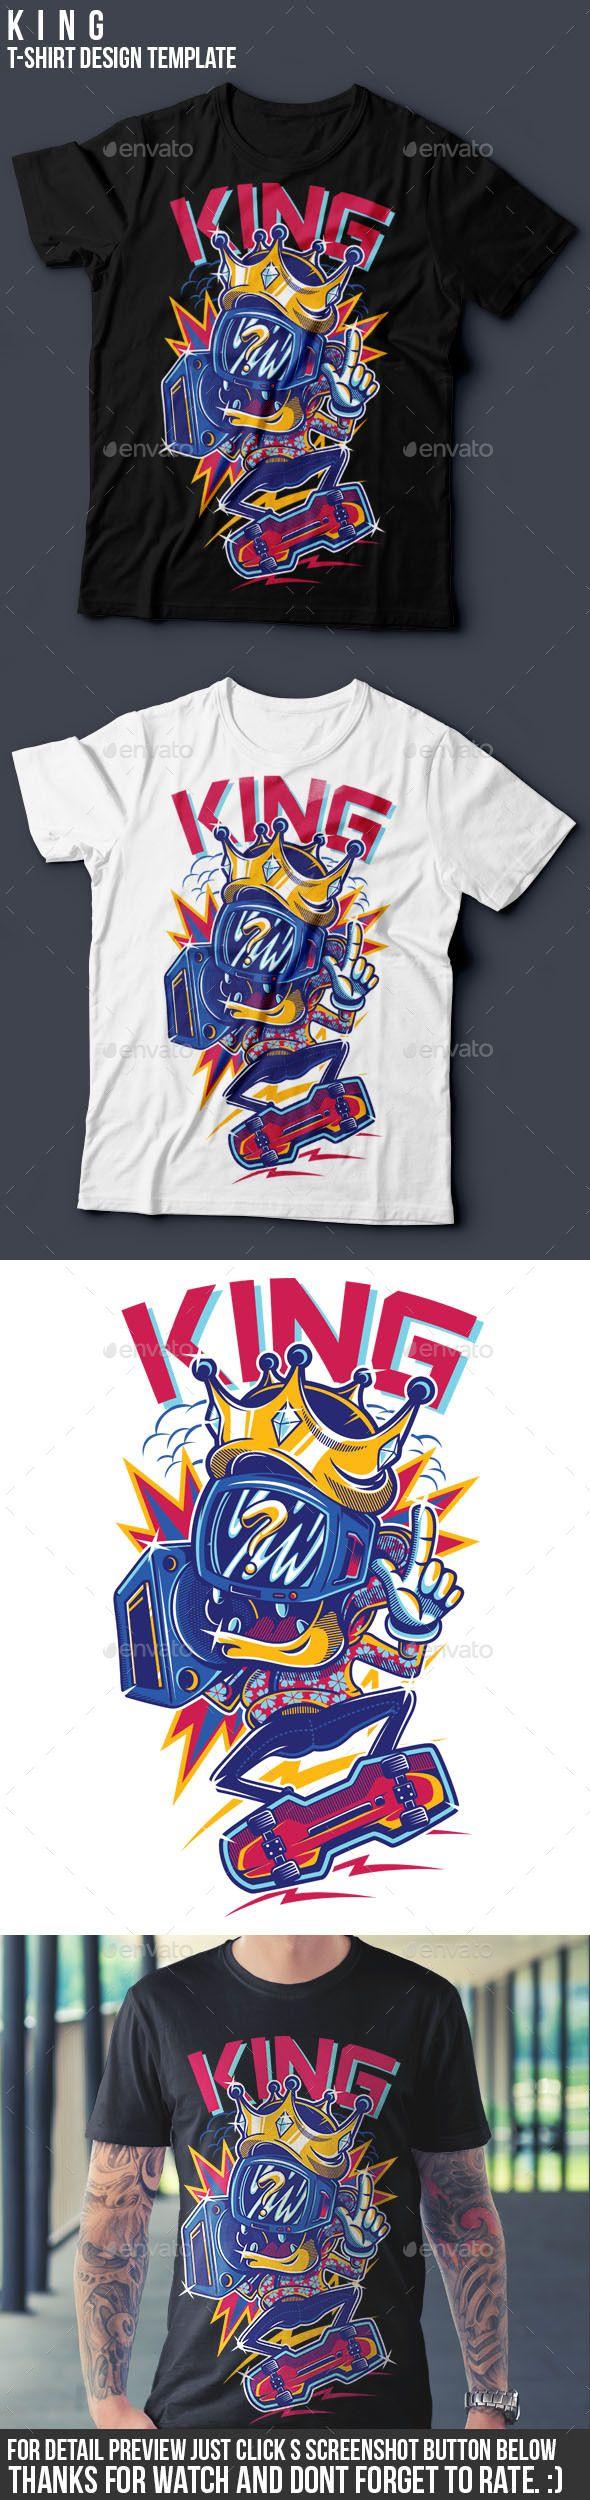 KING T-Shirt Design illustration Template Vector EPS, Transparent PNG, AI Illustrator. Download here: http://graphicriver.net/item/king-tshirt-design-/15853356?ref=ksioks